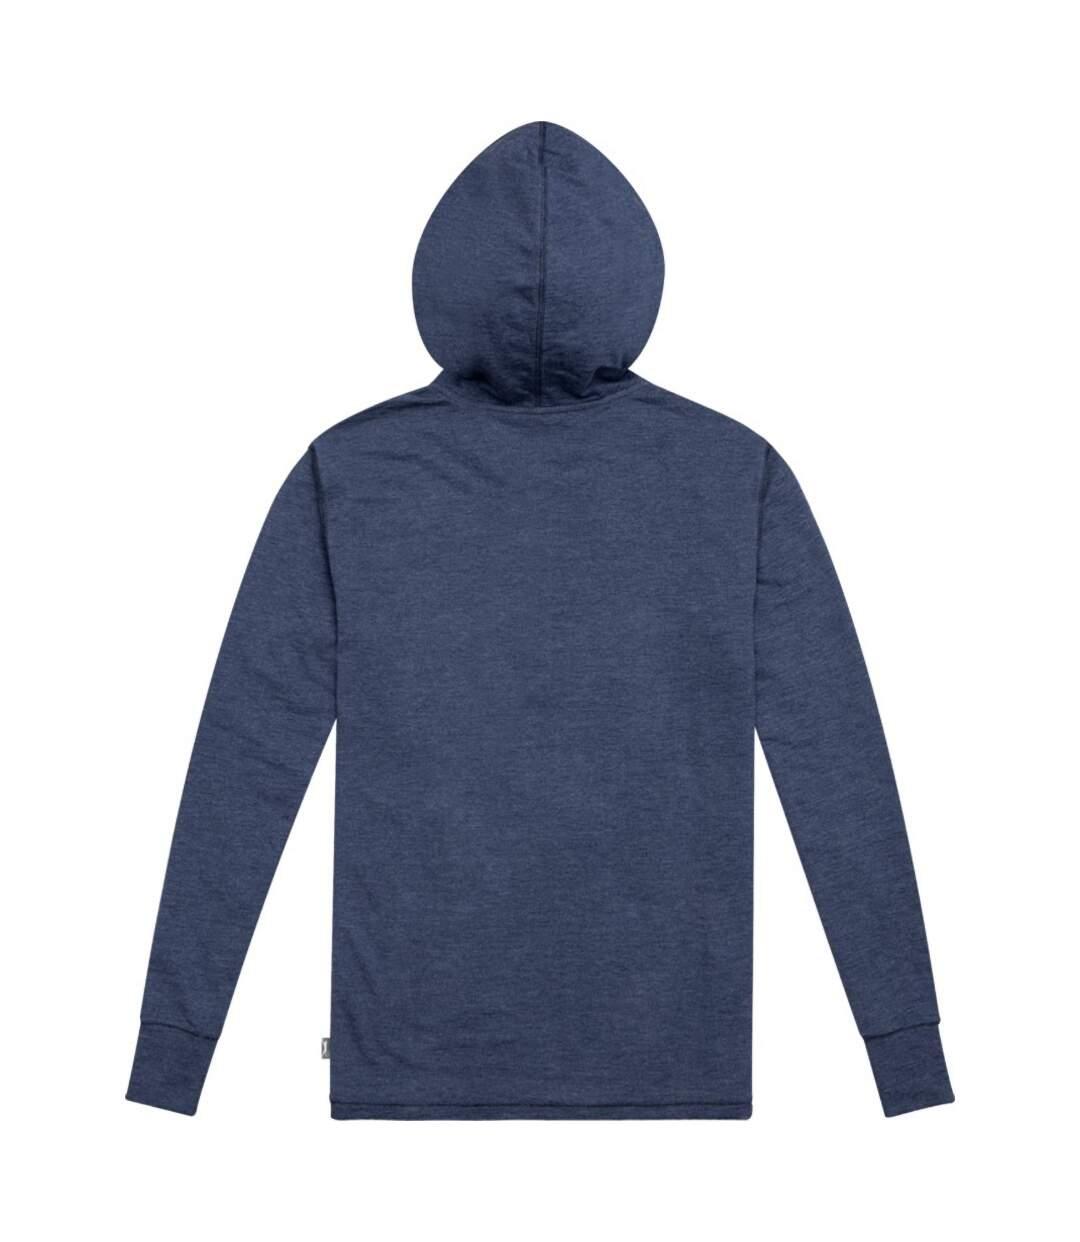 Slazenger Mens Reflex Knit Hoodie (Heather Blue) - UTPF1766